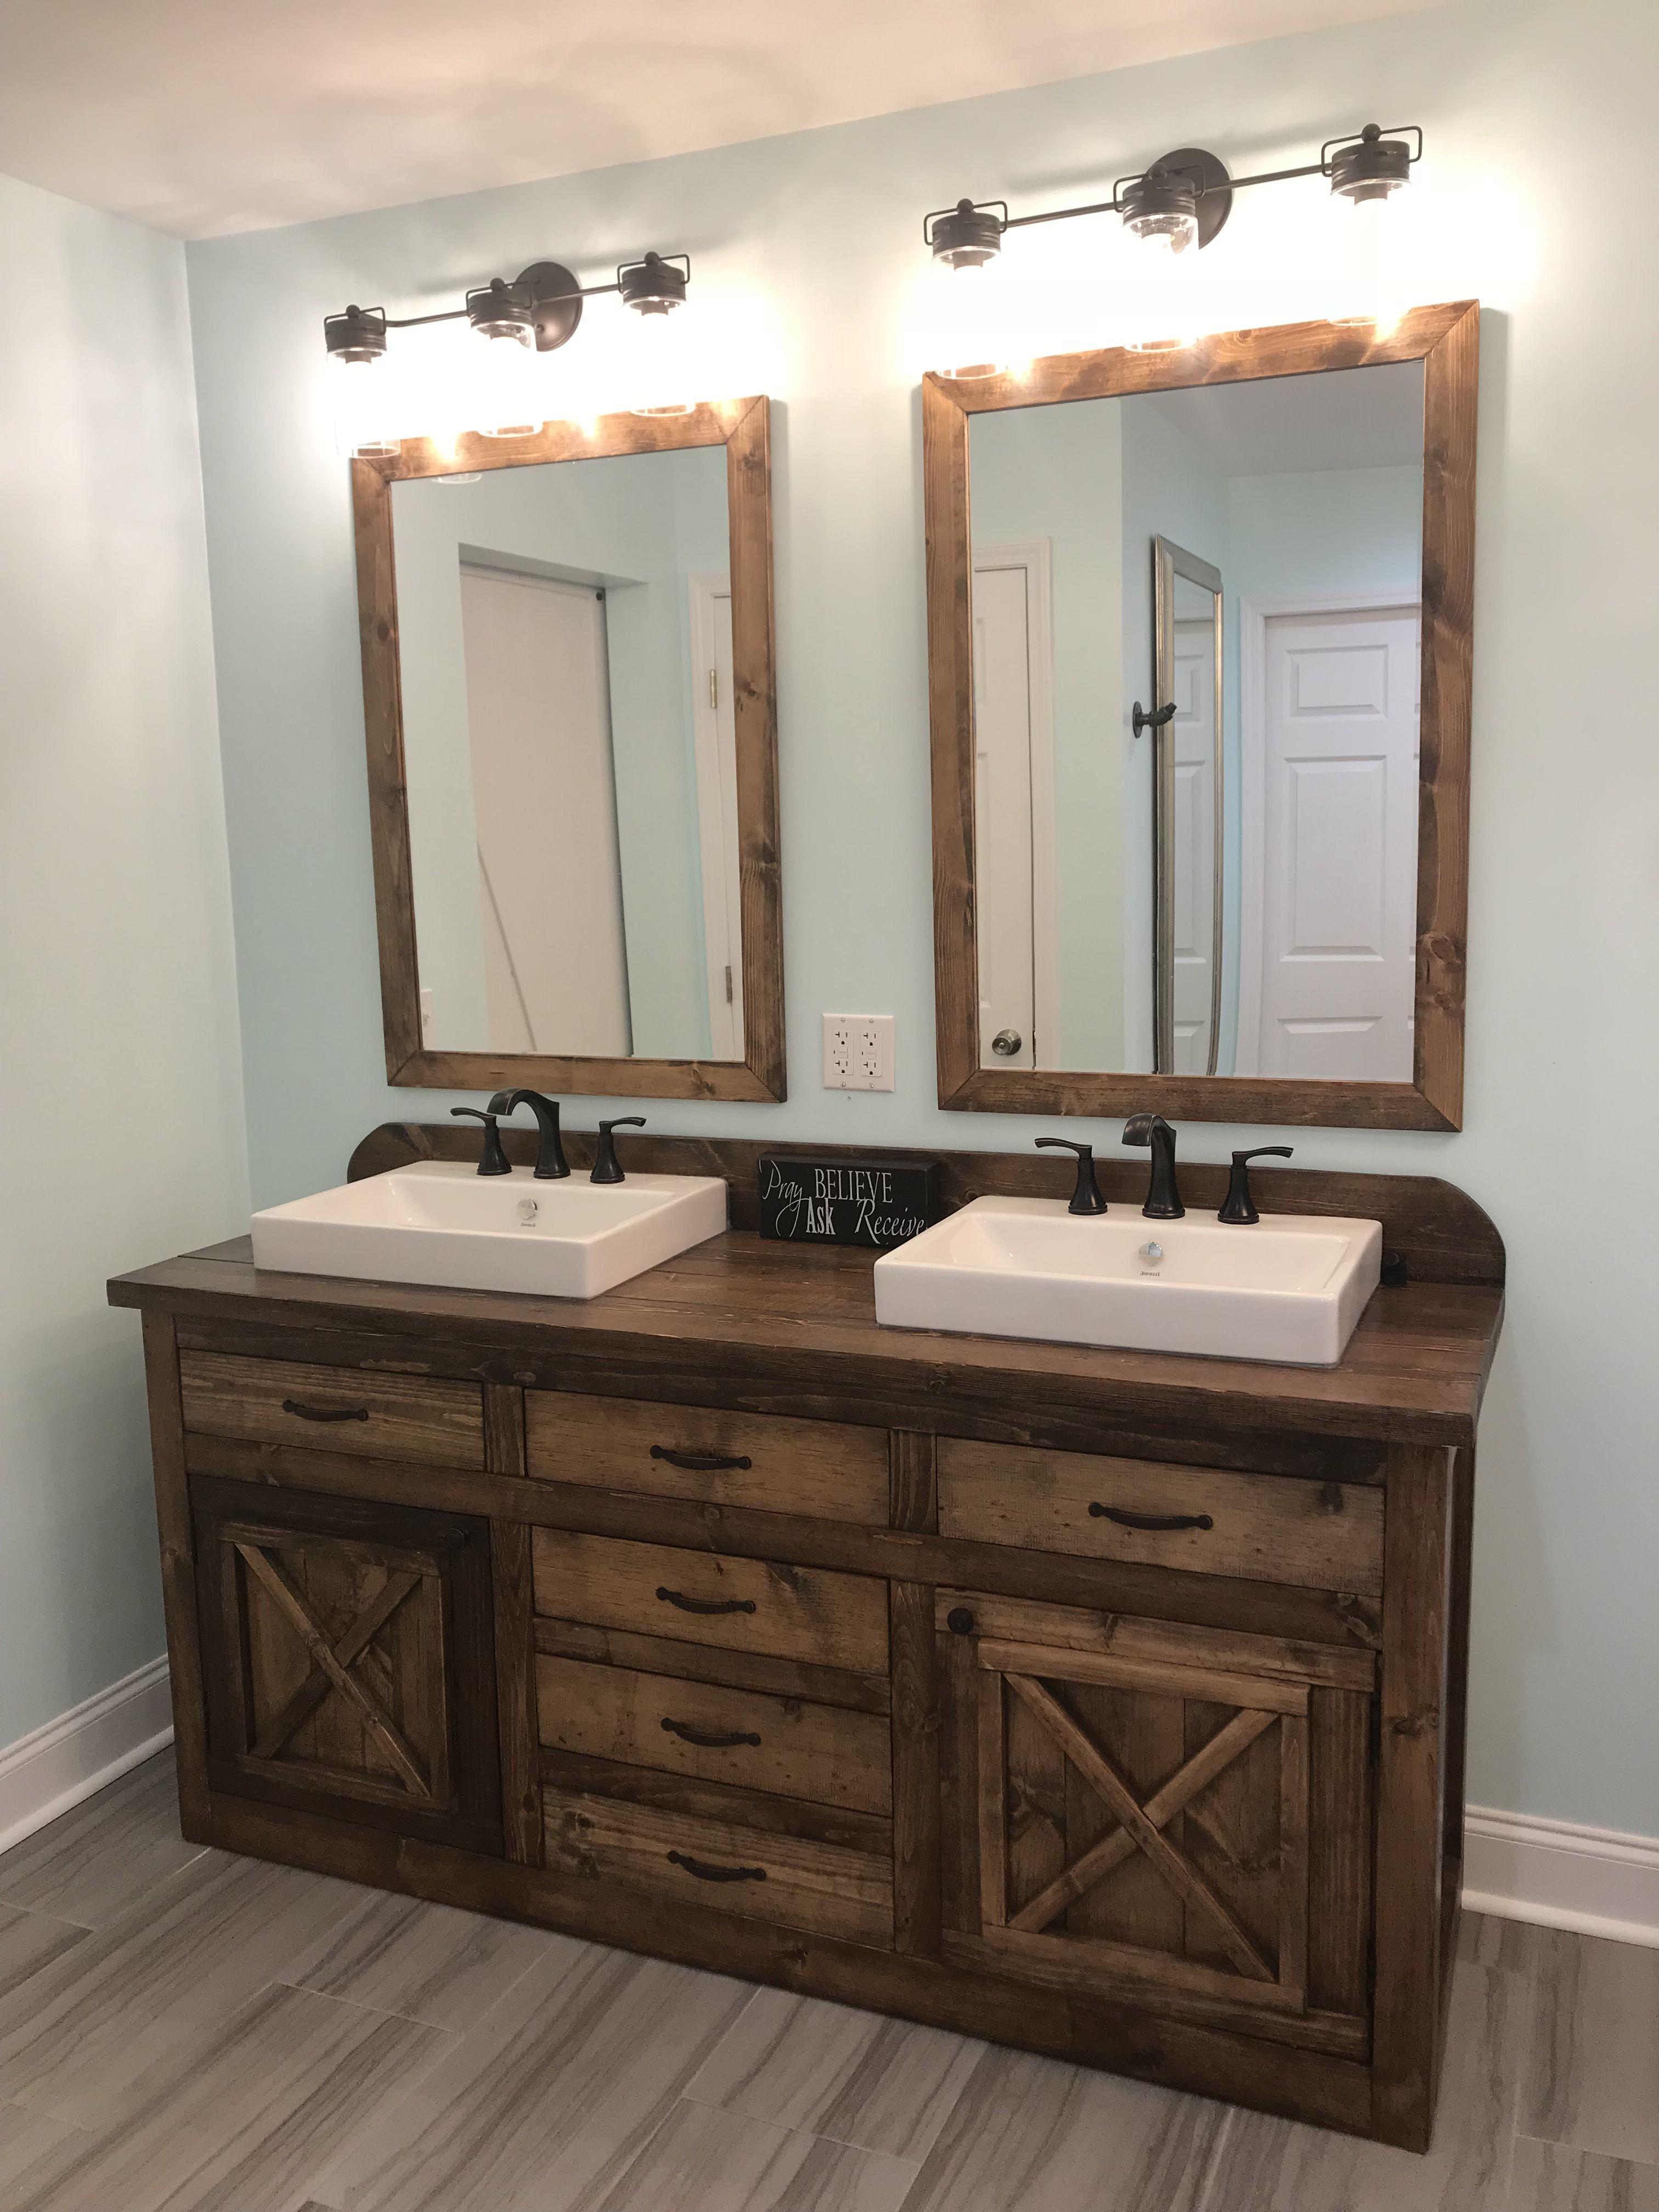 Our Farmhouse Double Vanity Double Vanity Bathroom Farmhouse Bathroom Vanity Small Bathroom